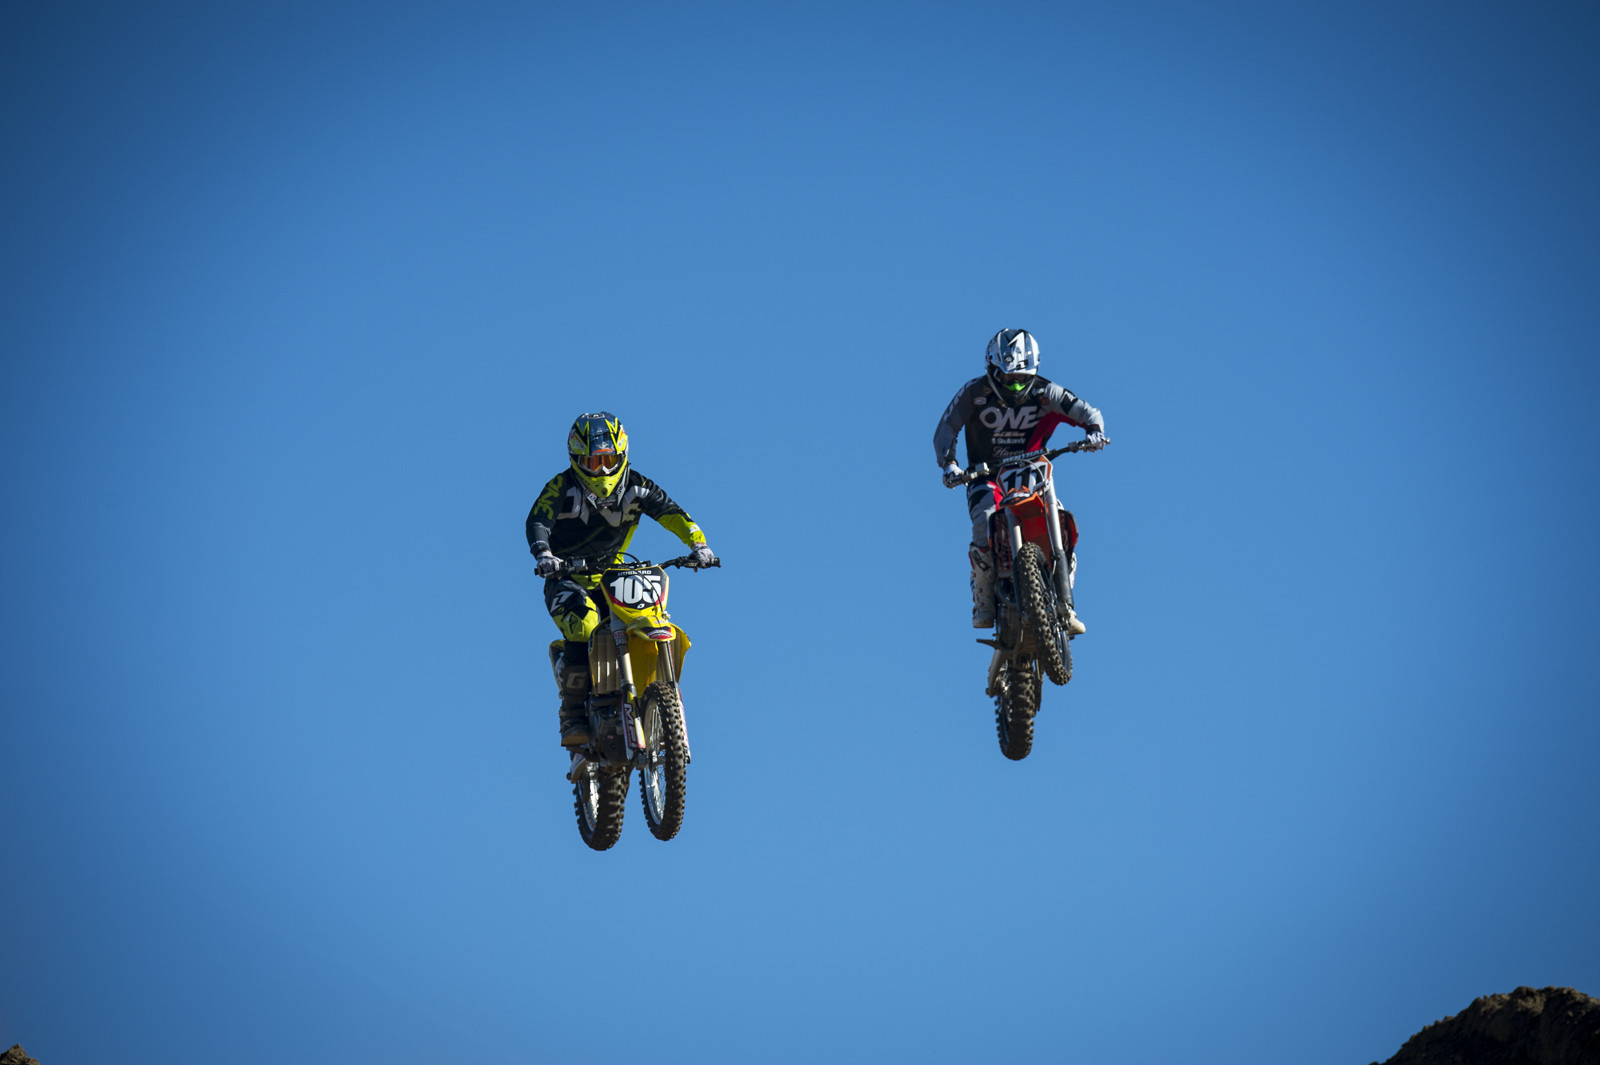 Chad Hubbard and Mike Sleeter - Ian Collins - Mountain Biking Pictures - Vital MTB